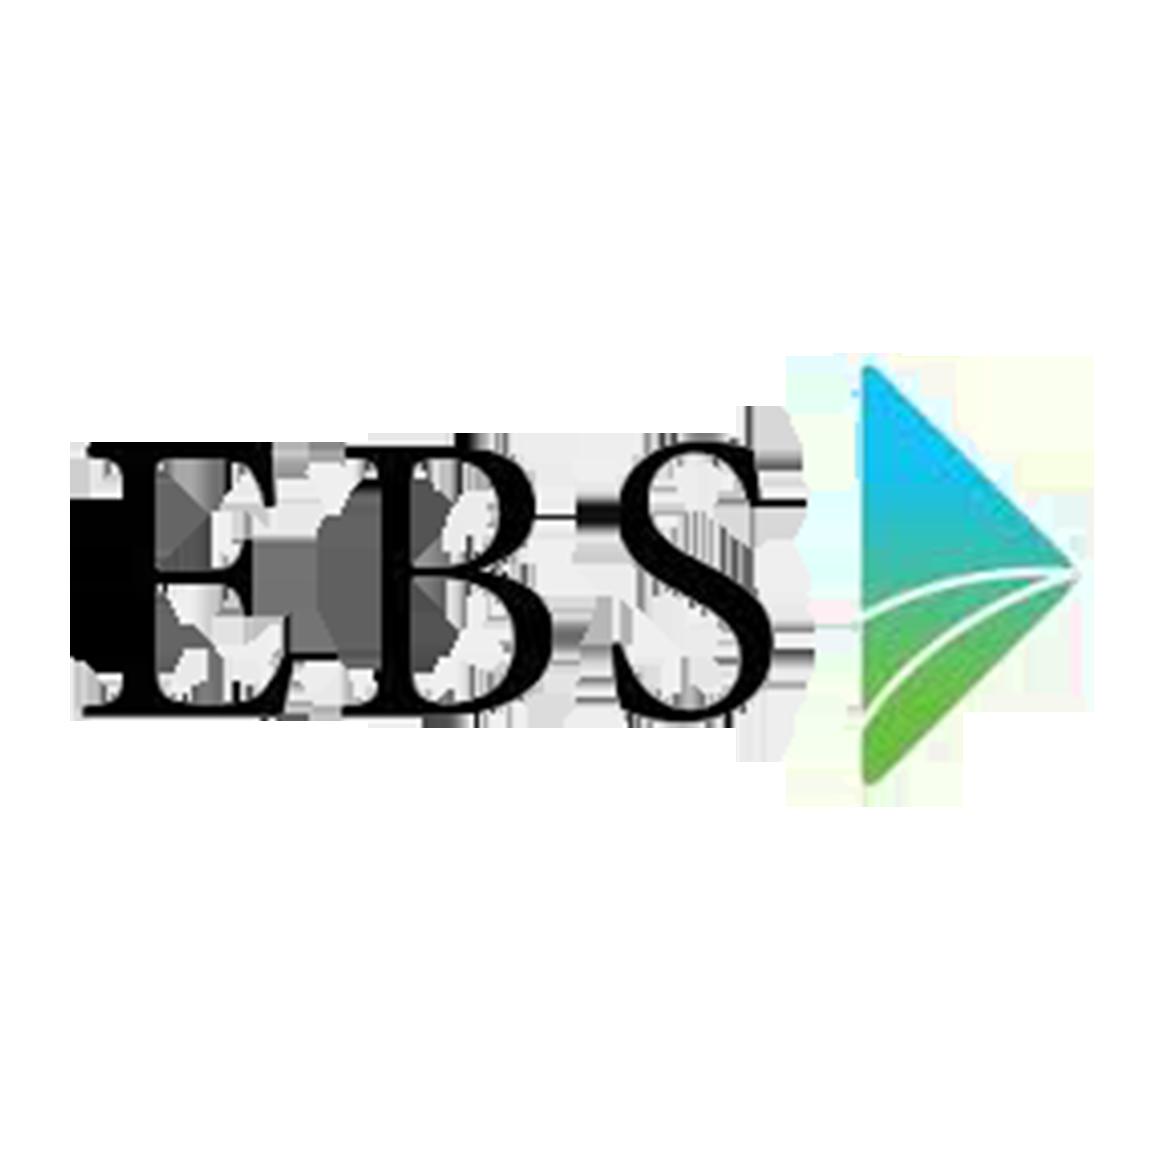 Ebs kinder dagkaartje waterlanddagkaart ebs for Ebs rotterdam